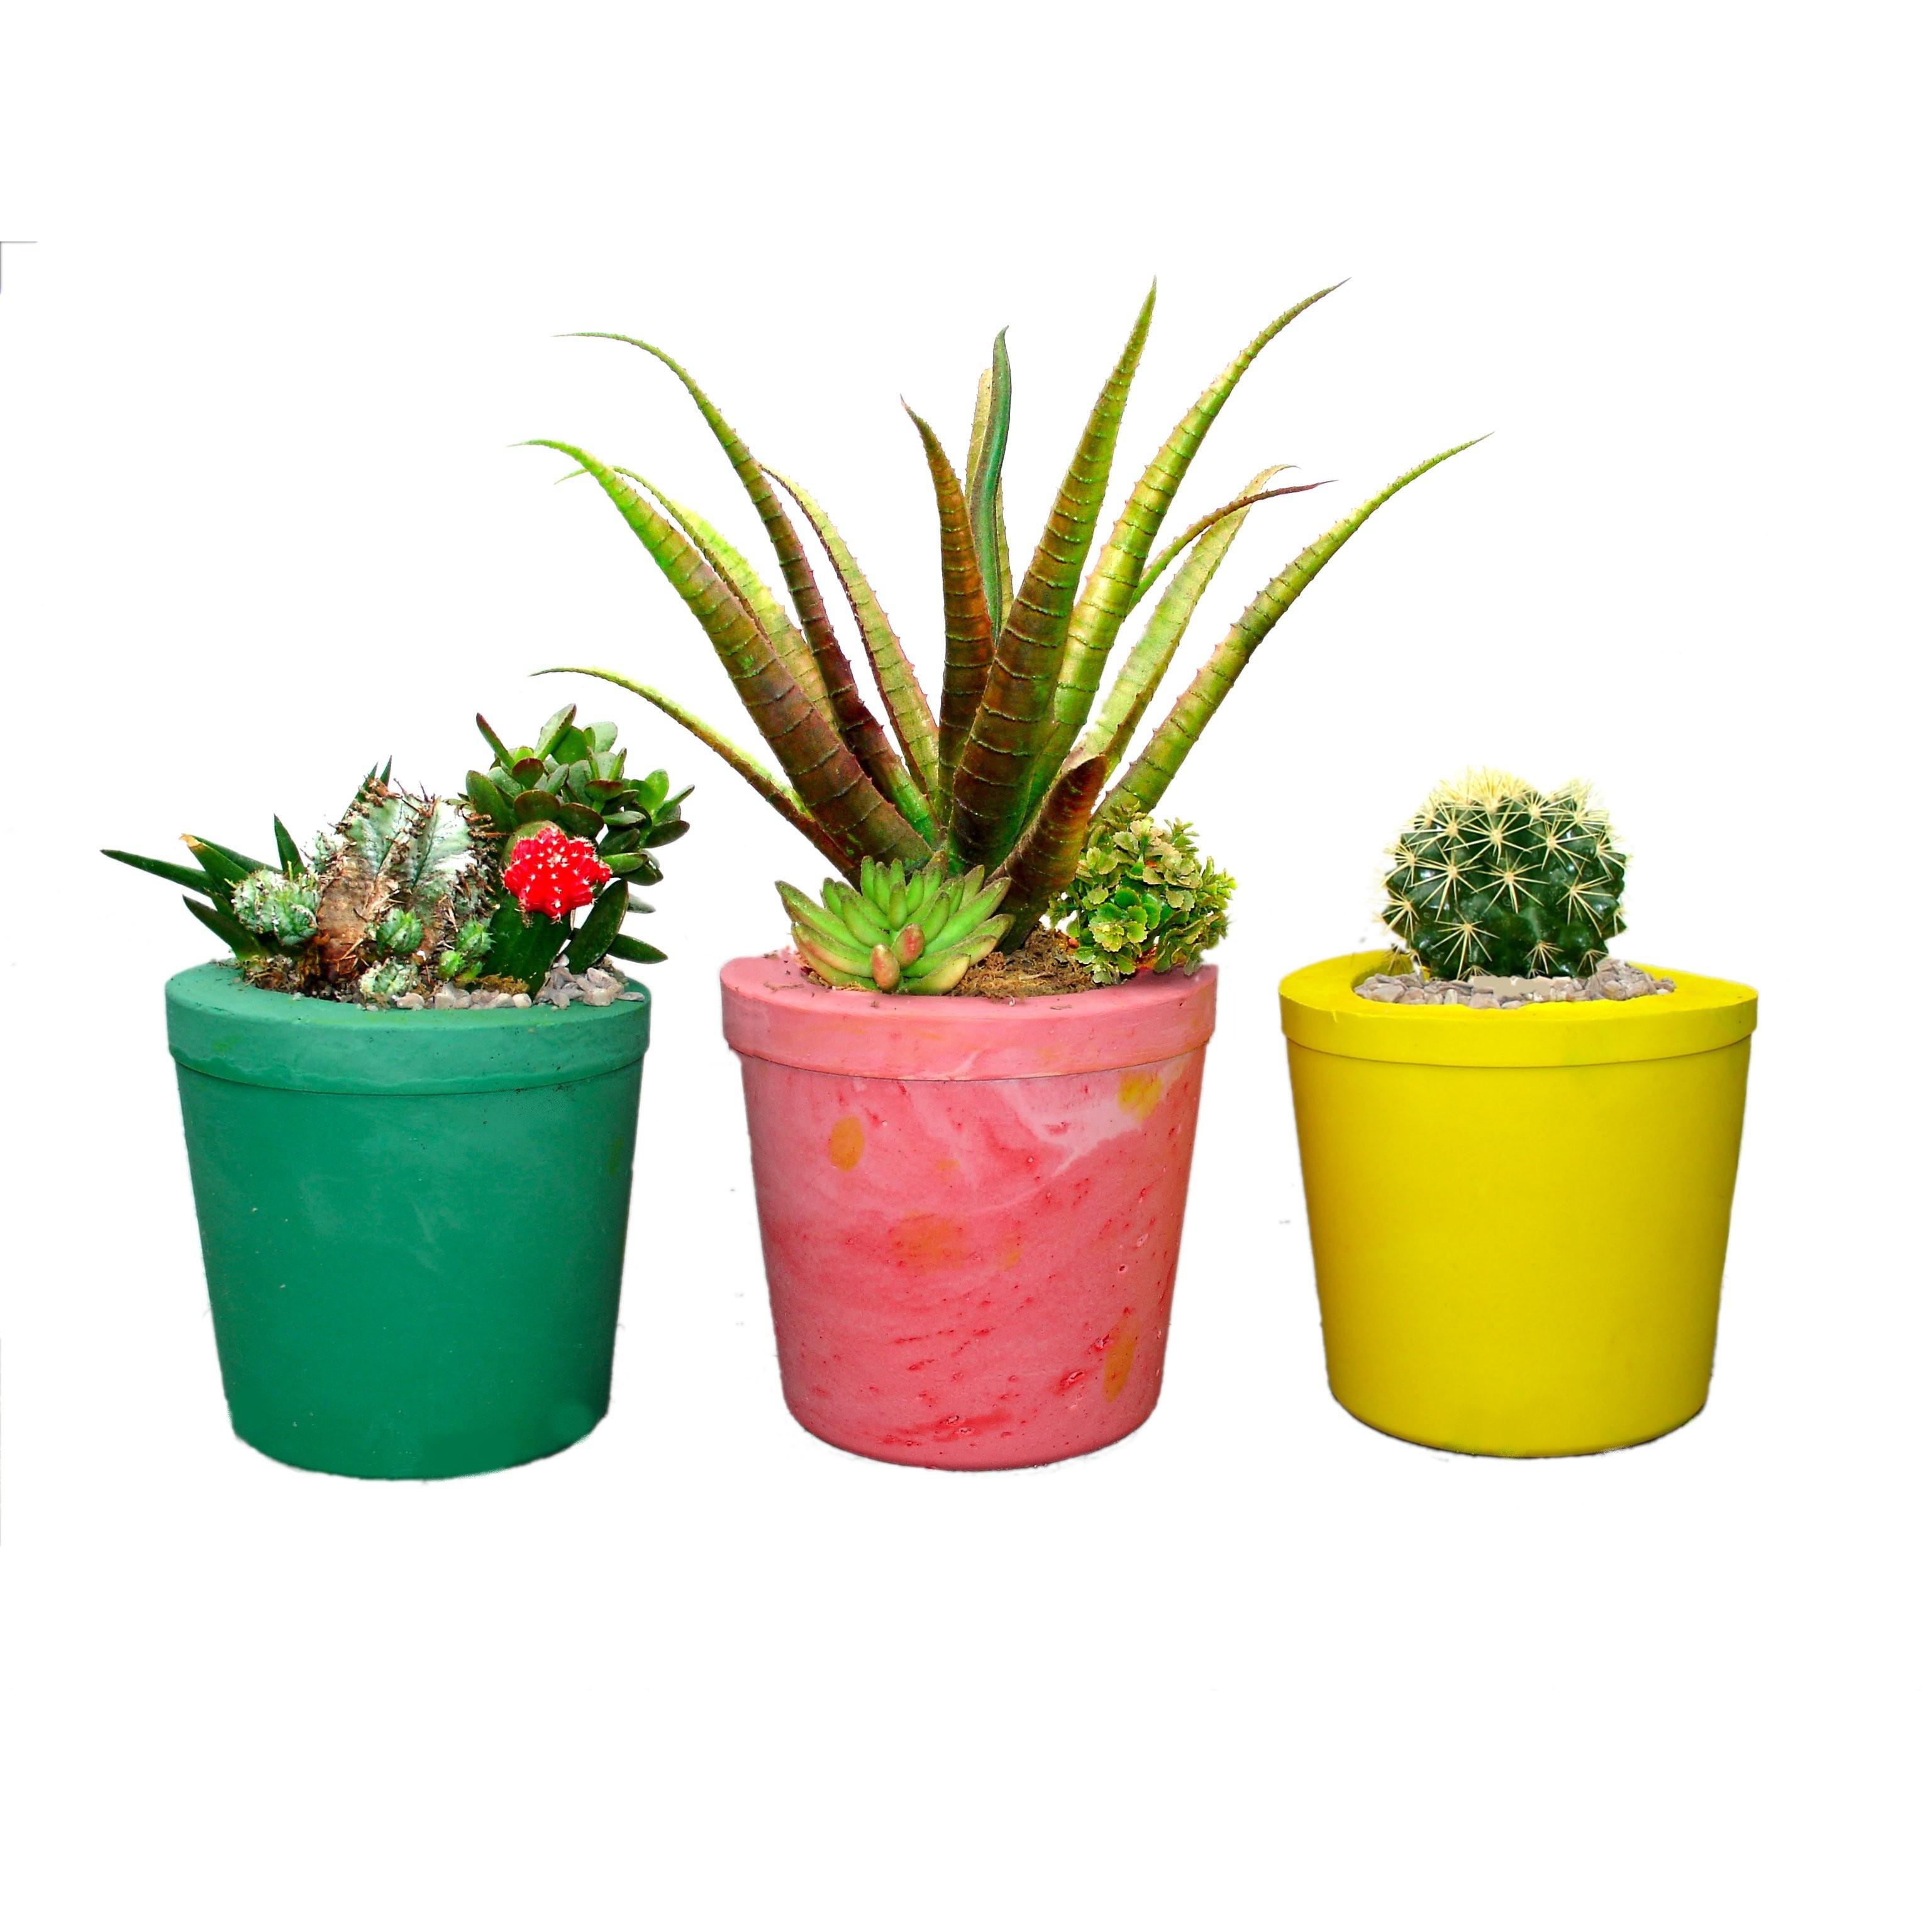 plant pots magic planting pot casting kit- make a plant a home CJKPLHG